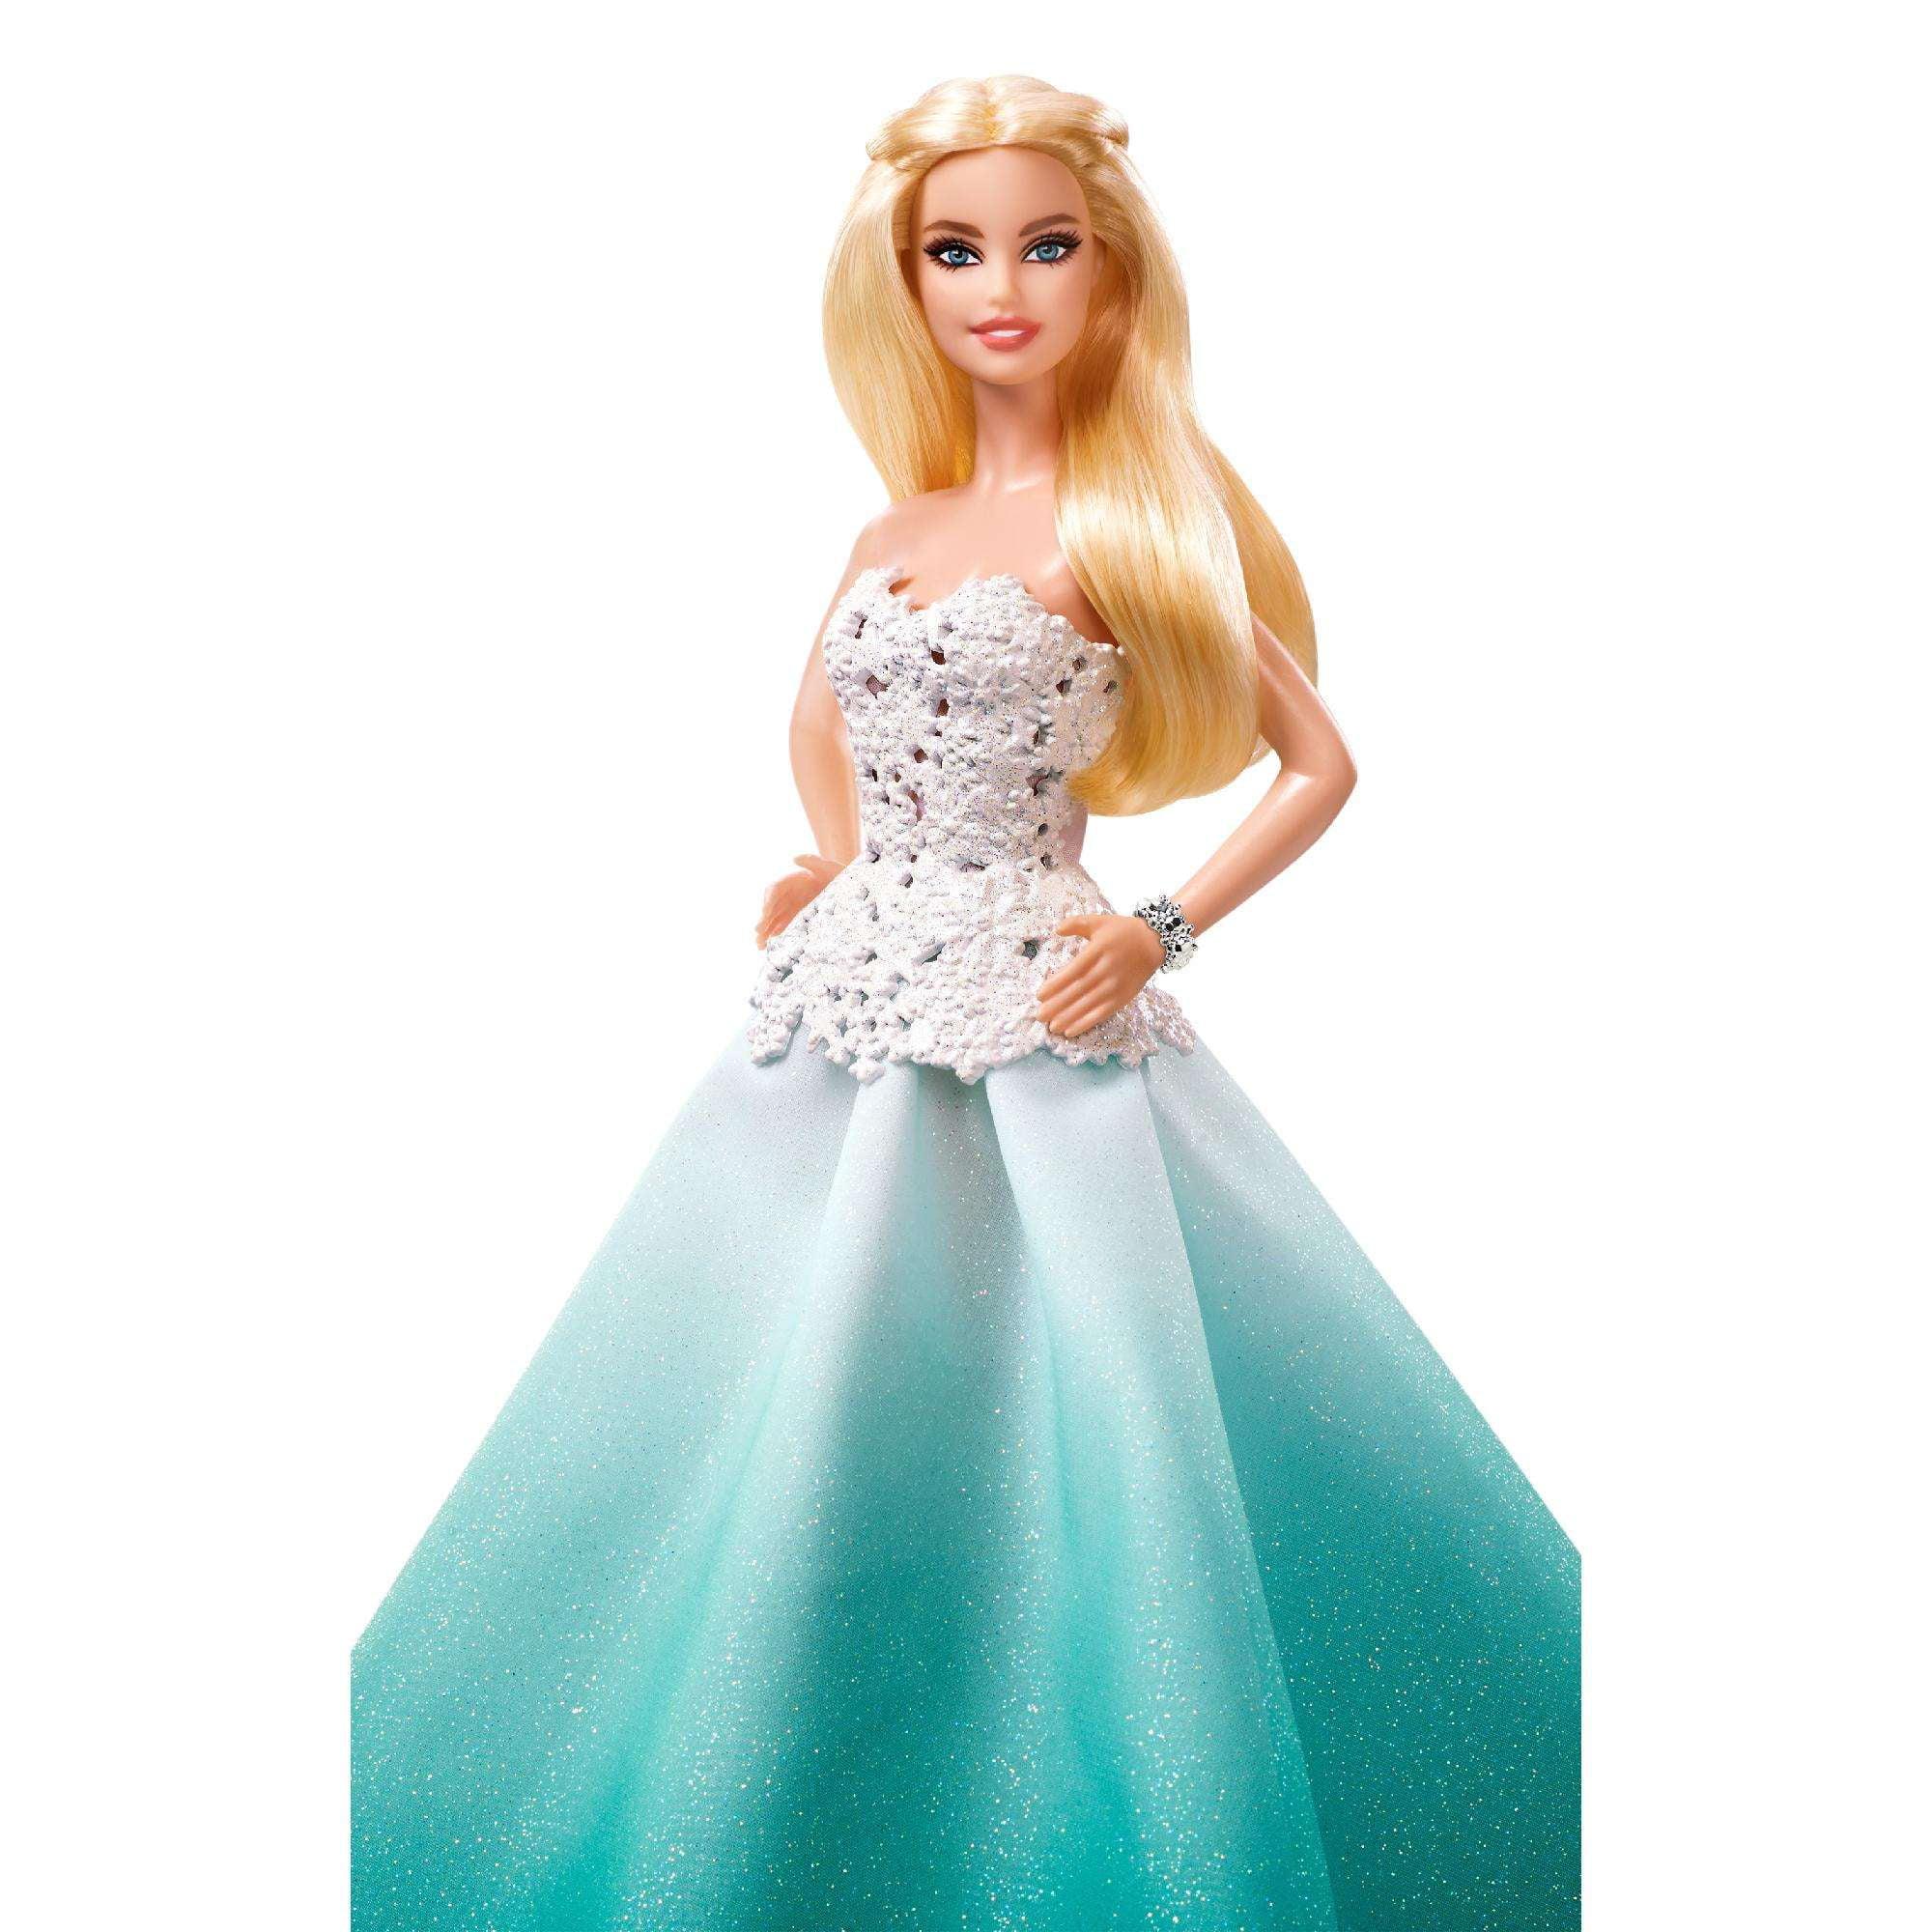 2016 Barbie Holiday Doll - Walmart.com